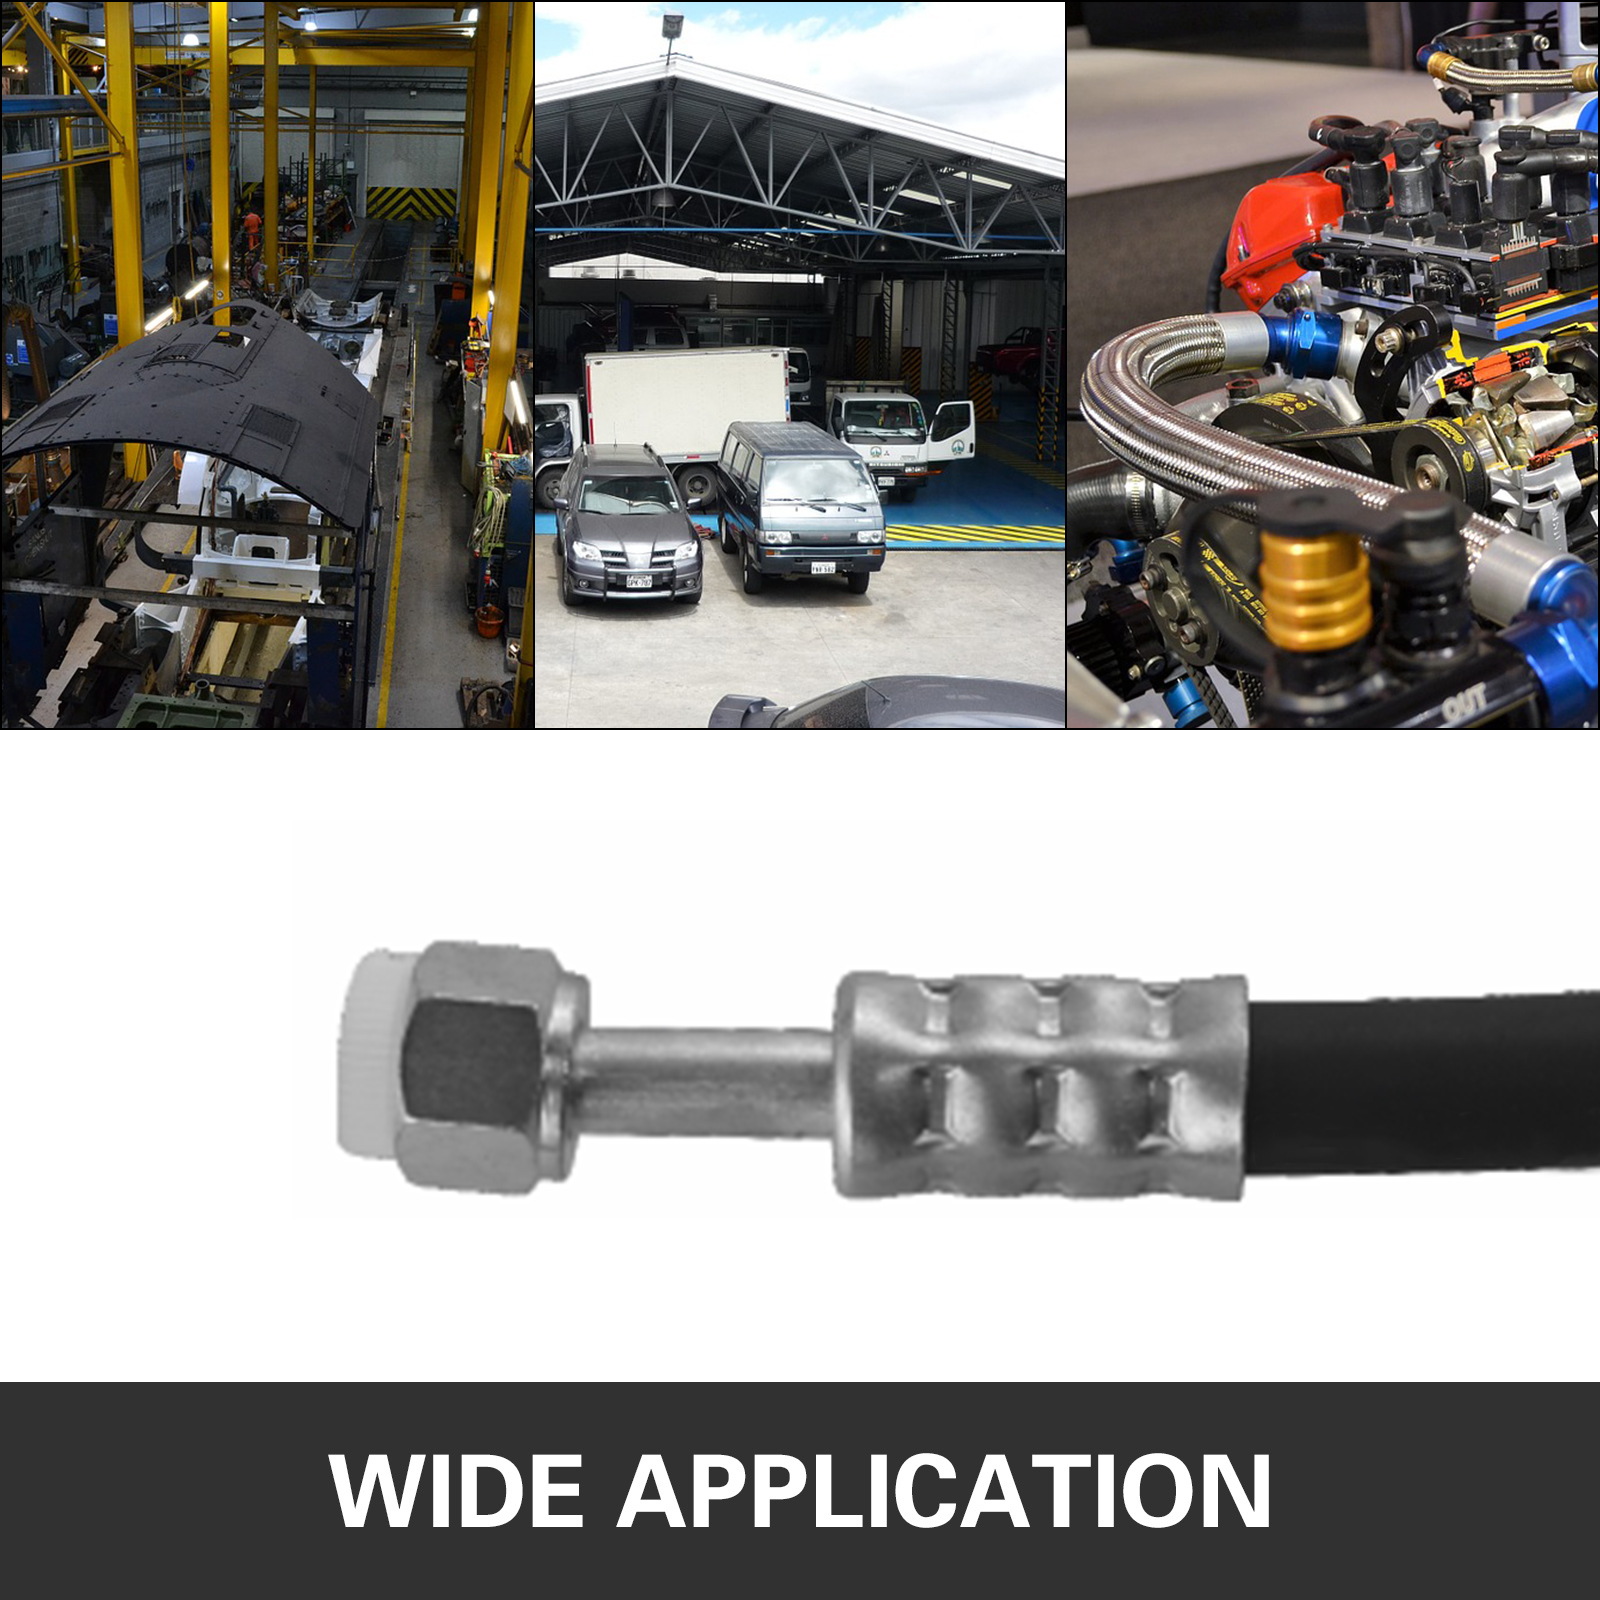 Hydraulic-A-C-Hose-Crimper-Tool-Kit-Hand-Tool-Crimping-Set-Hose-Fittings-7-Dies thumbnail 7